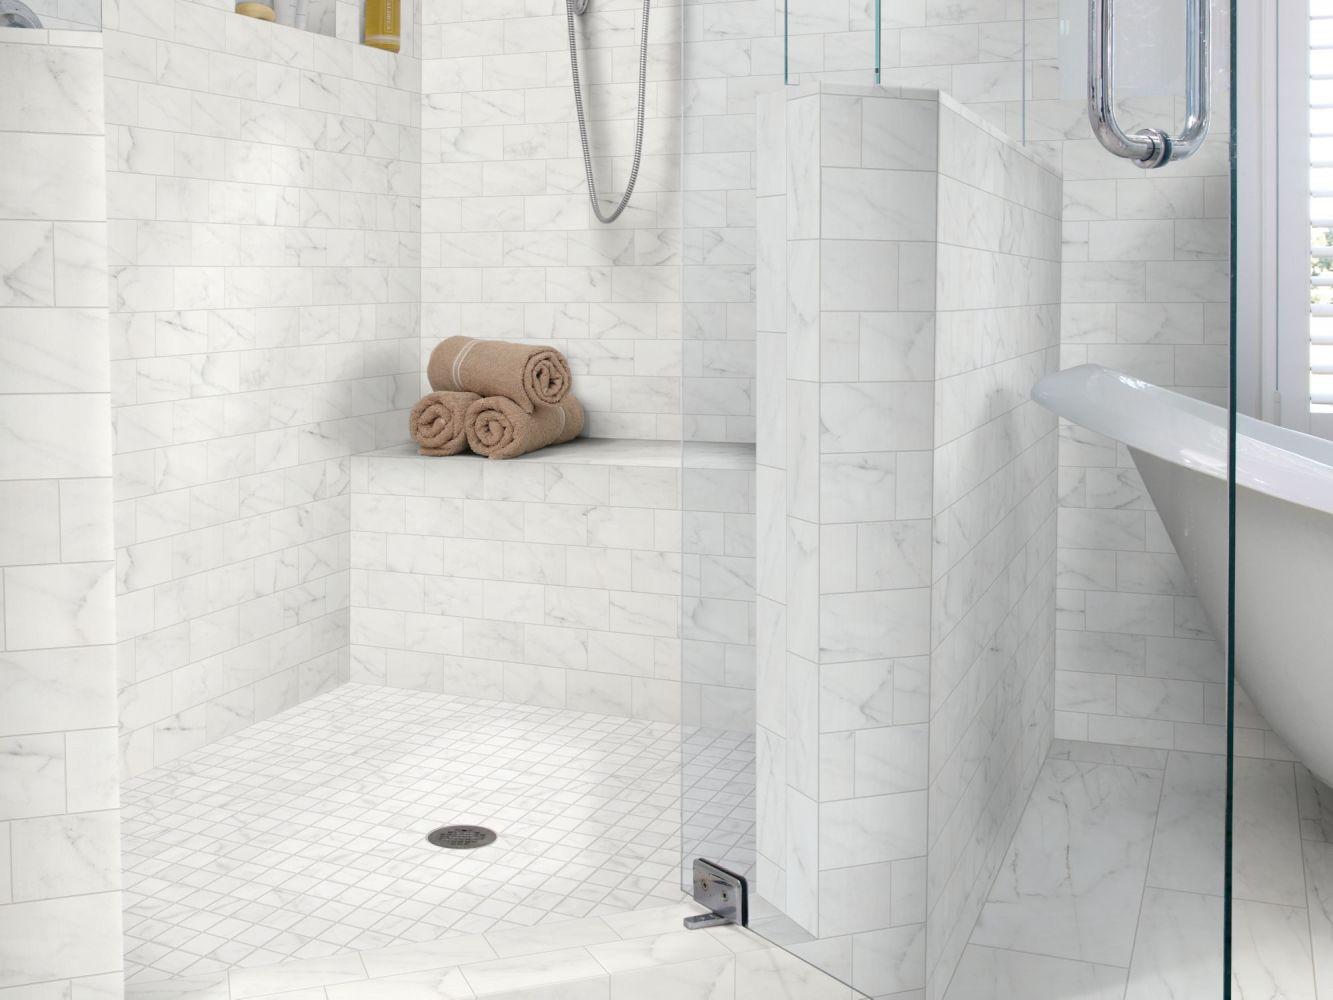 Shaw Floors Home Fn Gold Ceramic Caracalla 3×6 Wall Carrara 00150_TGM46